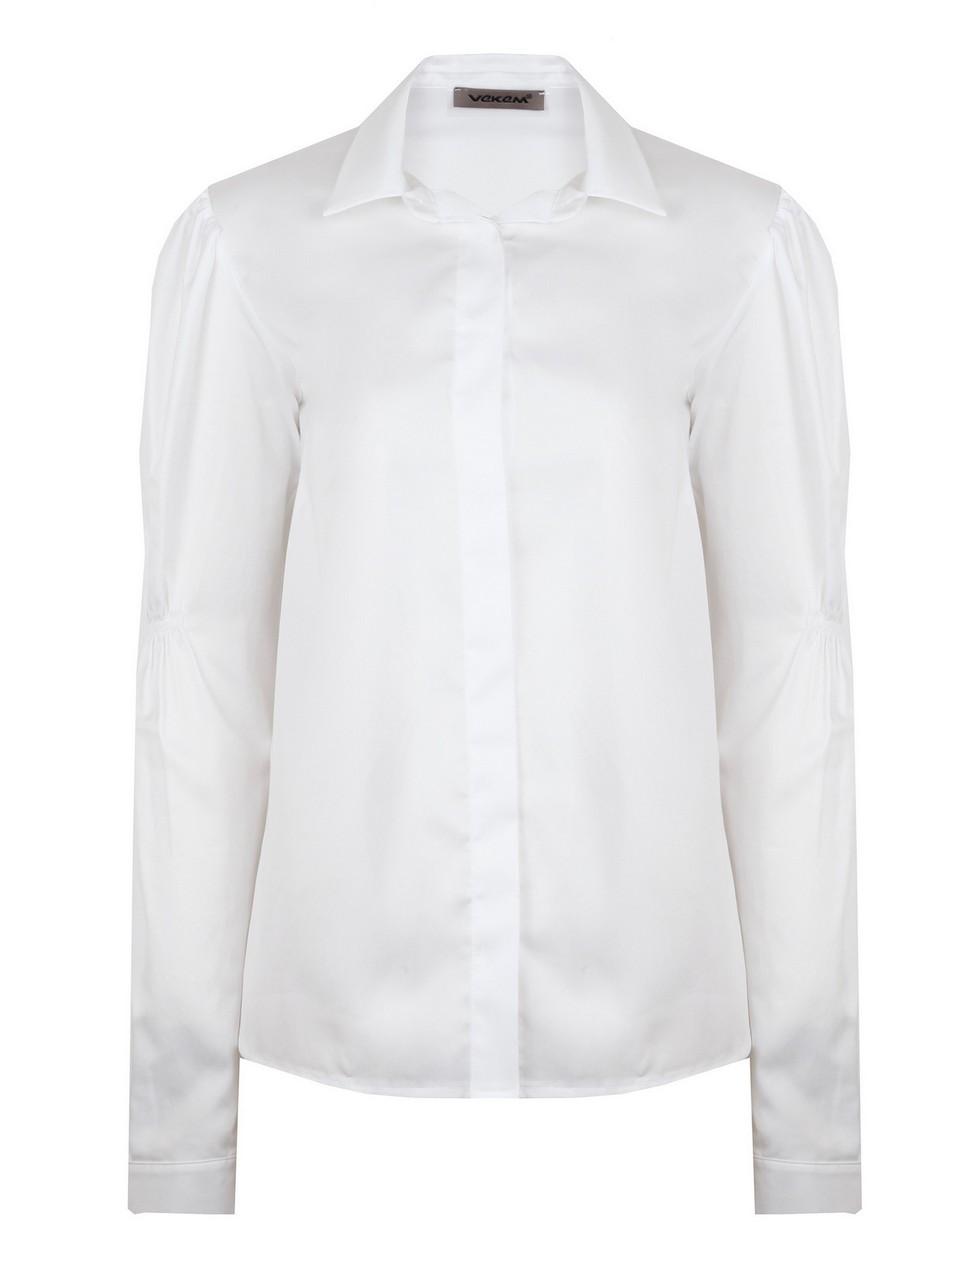 Plikaşe Detaylı %100 Pamuk Gömlek